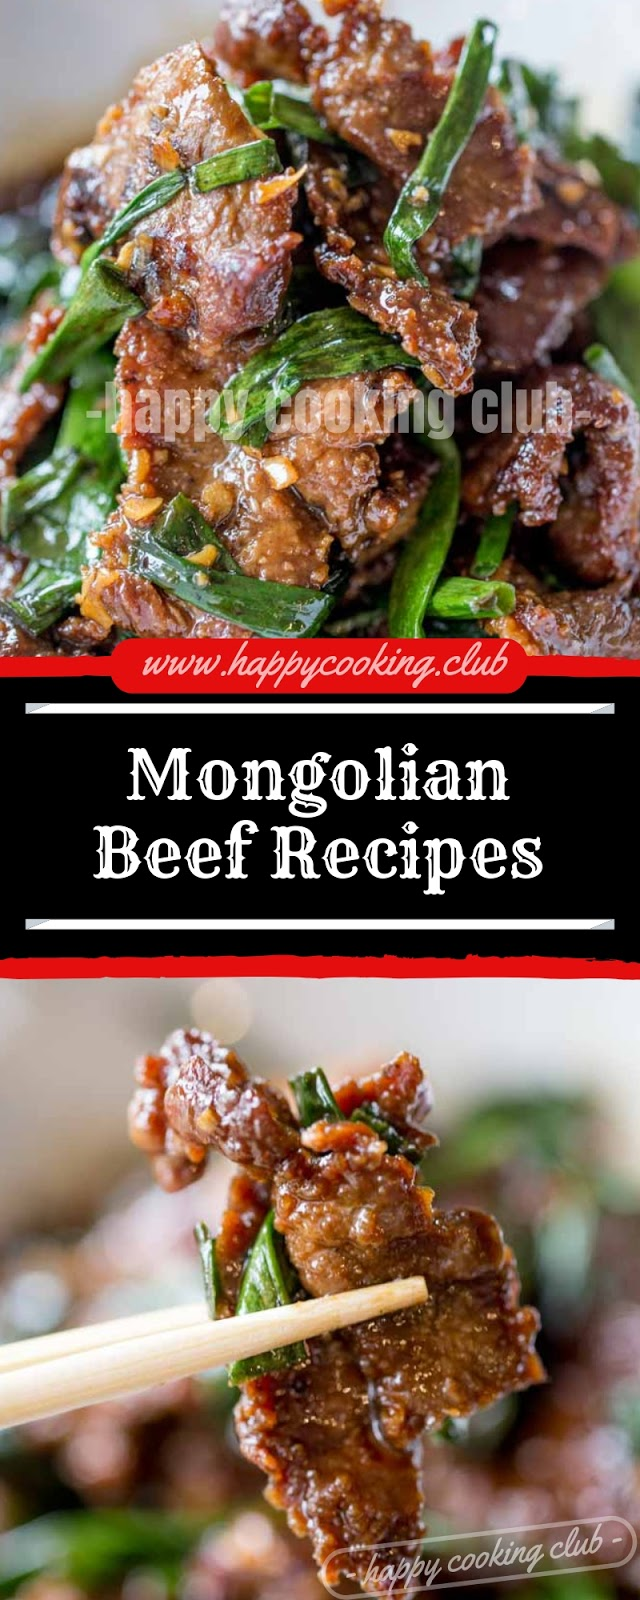 Mongolian Beef Recipes